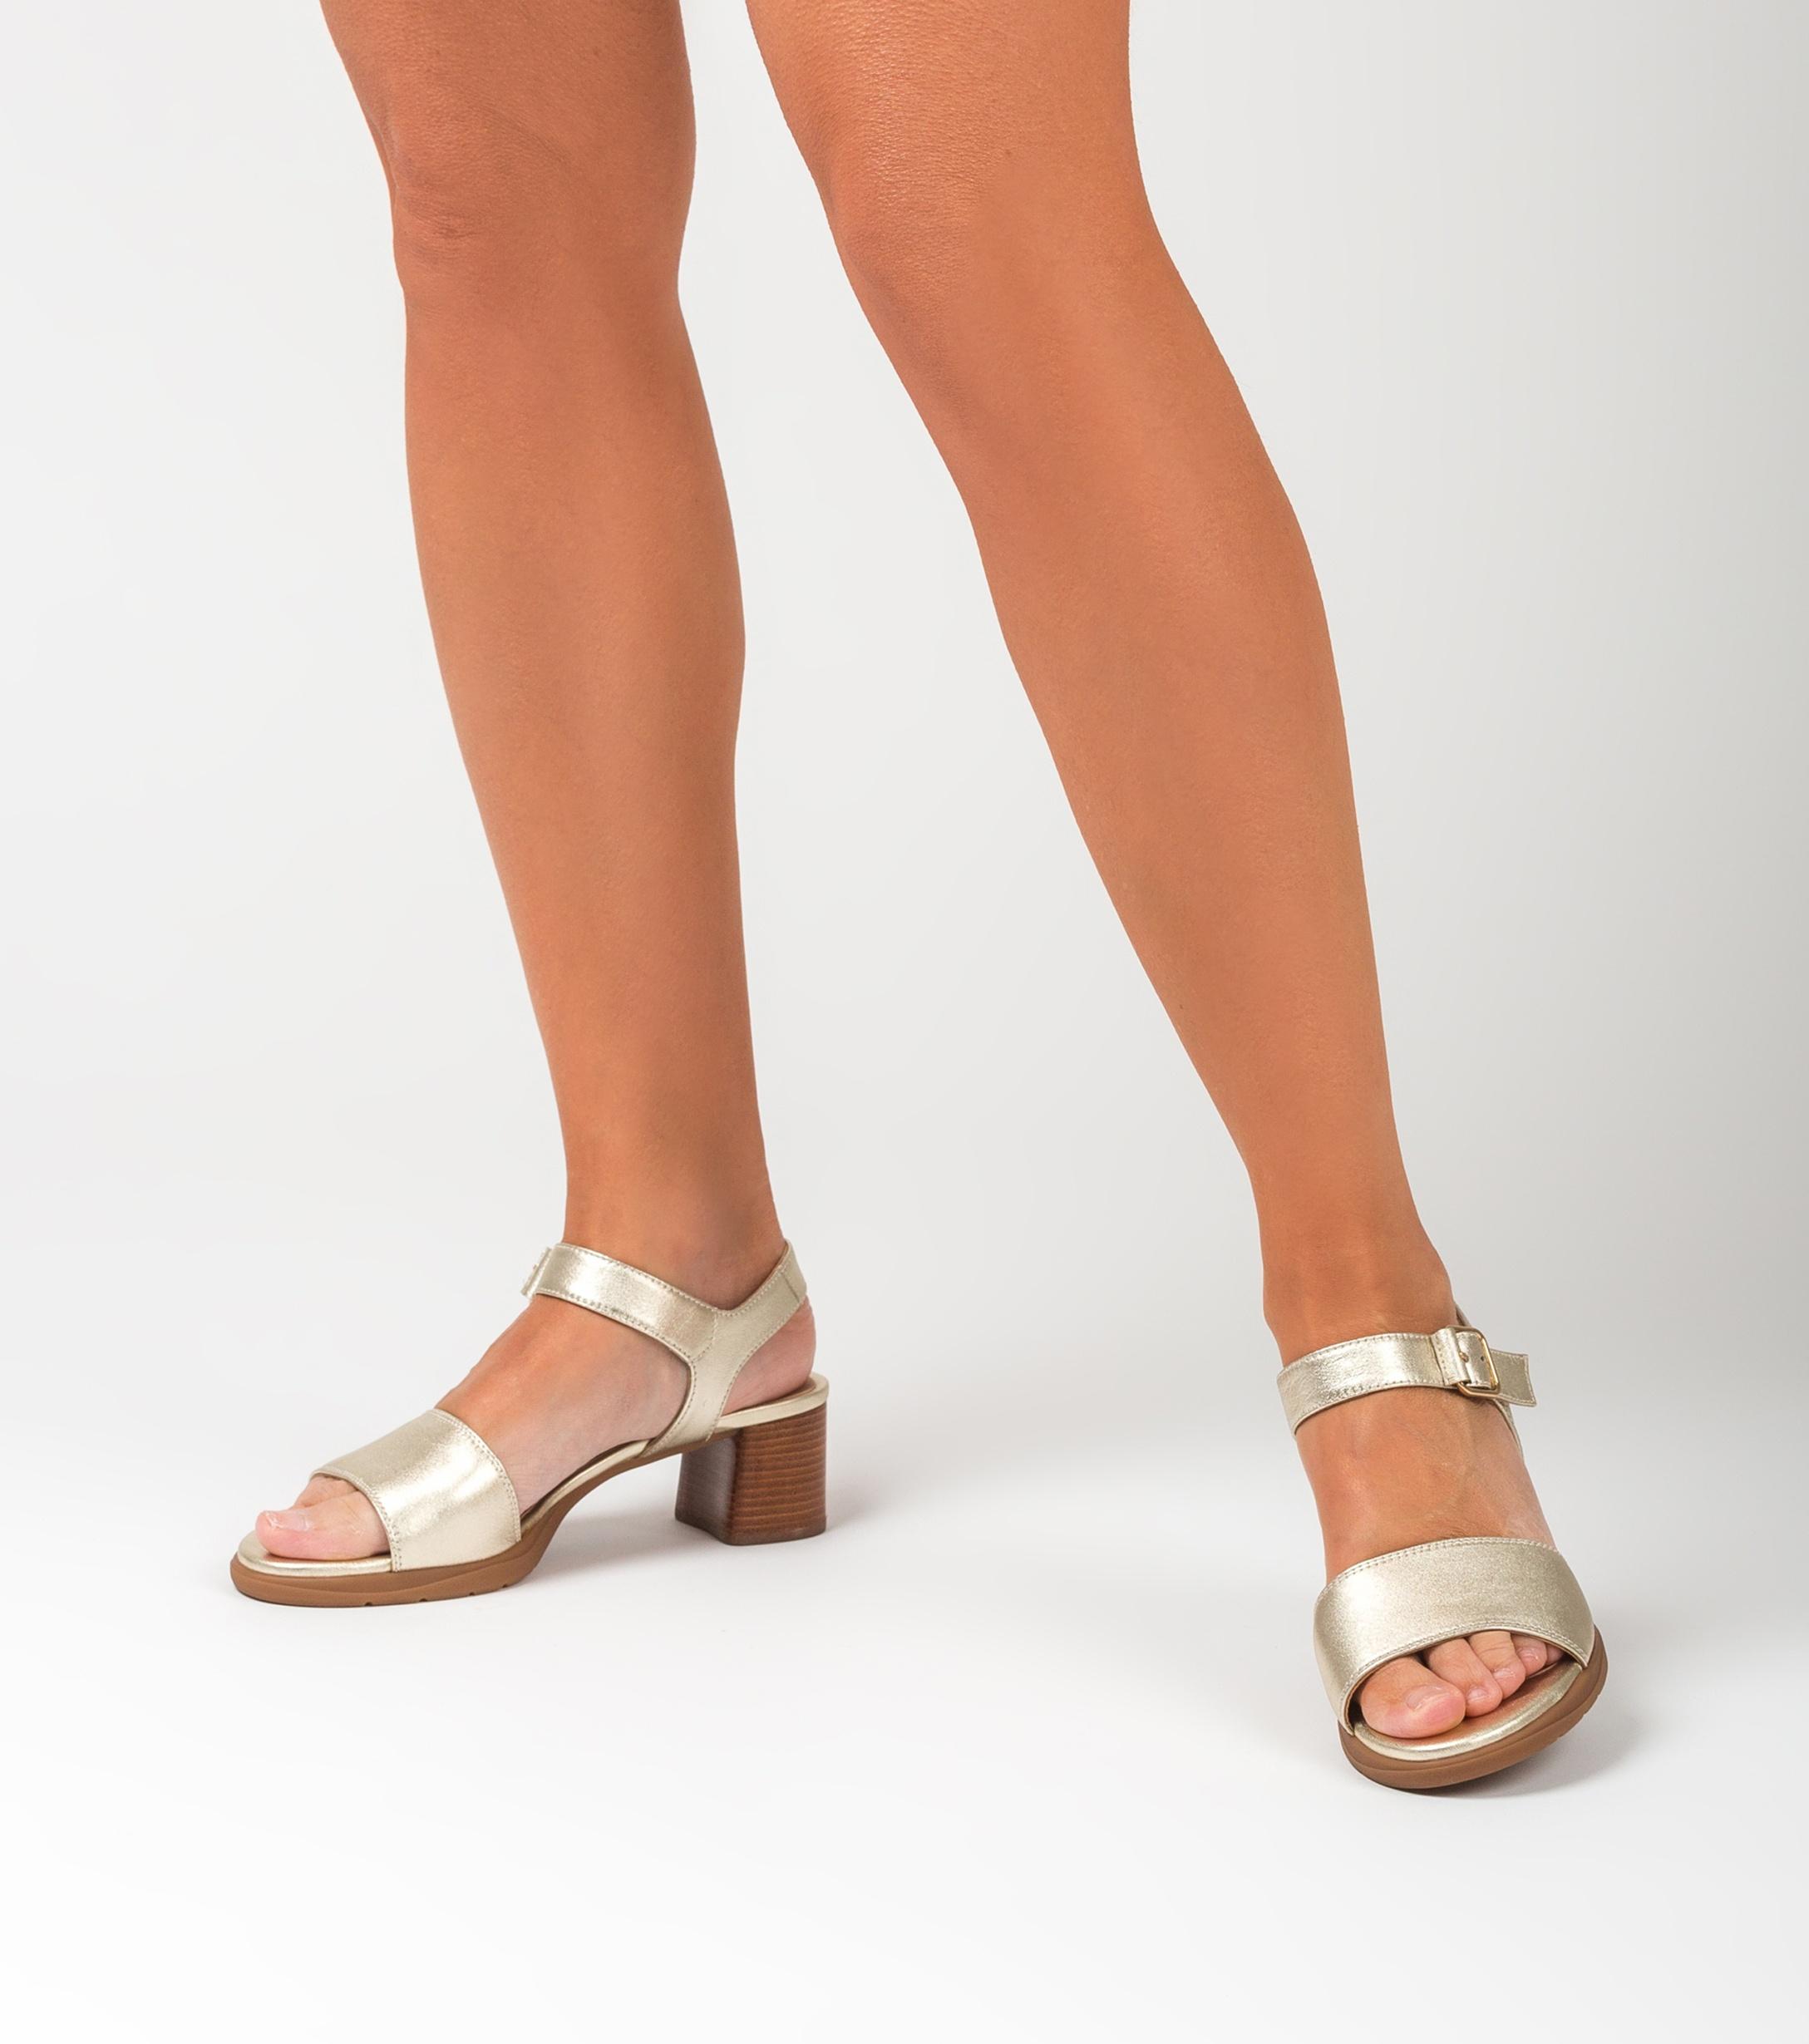 UNISA Light golden sandals wood effect heel GODOY_LMT platino 2